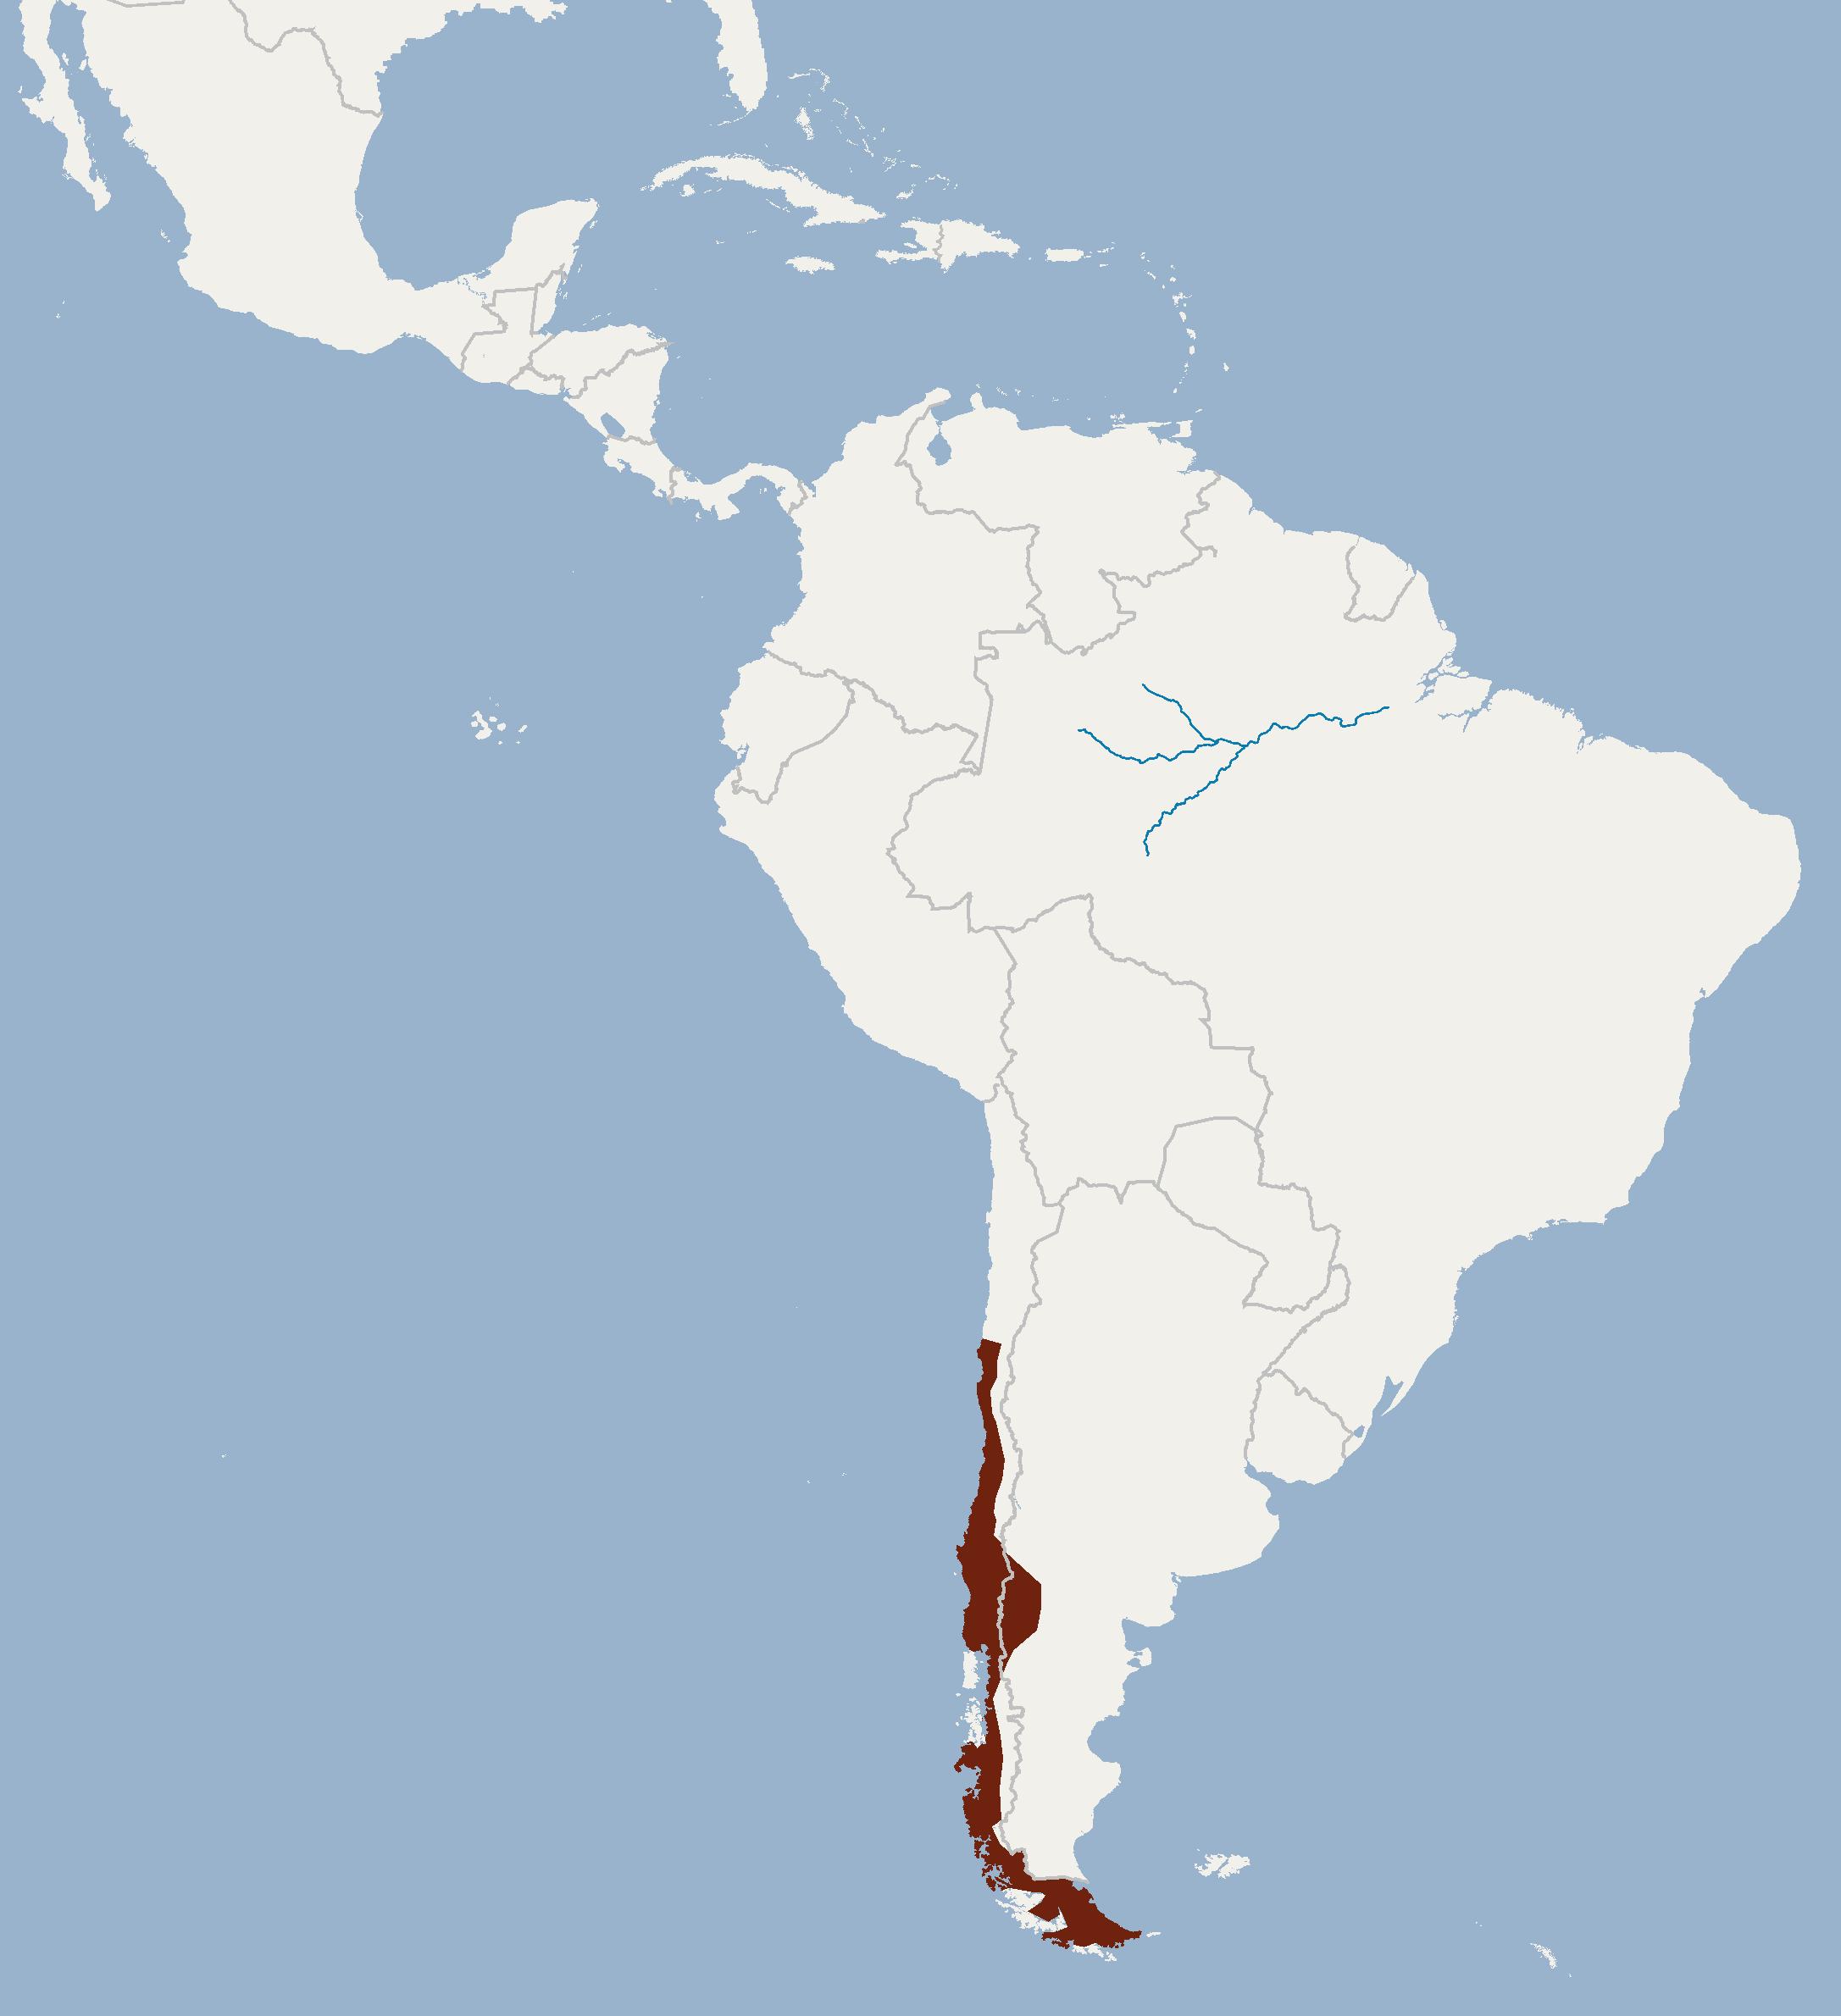 Chilenisches Mausohr – Wikipedia